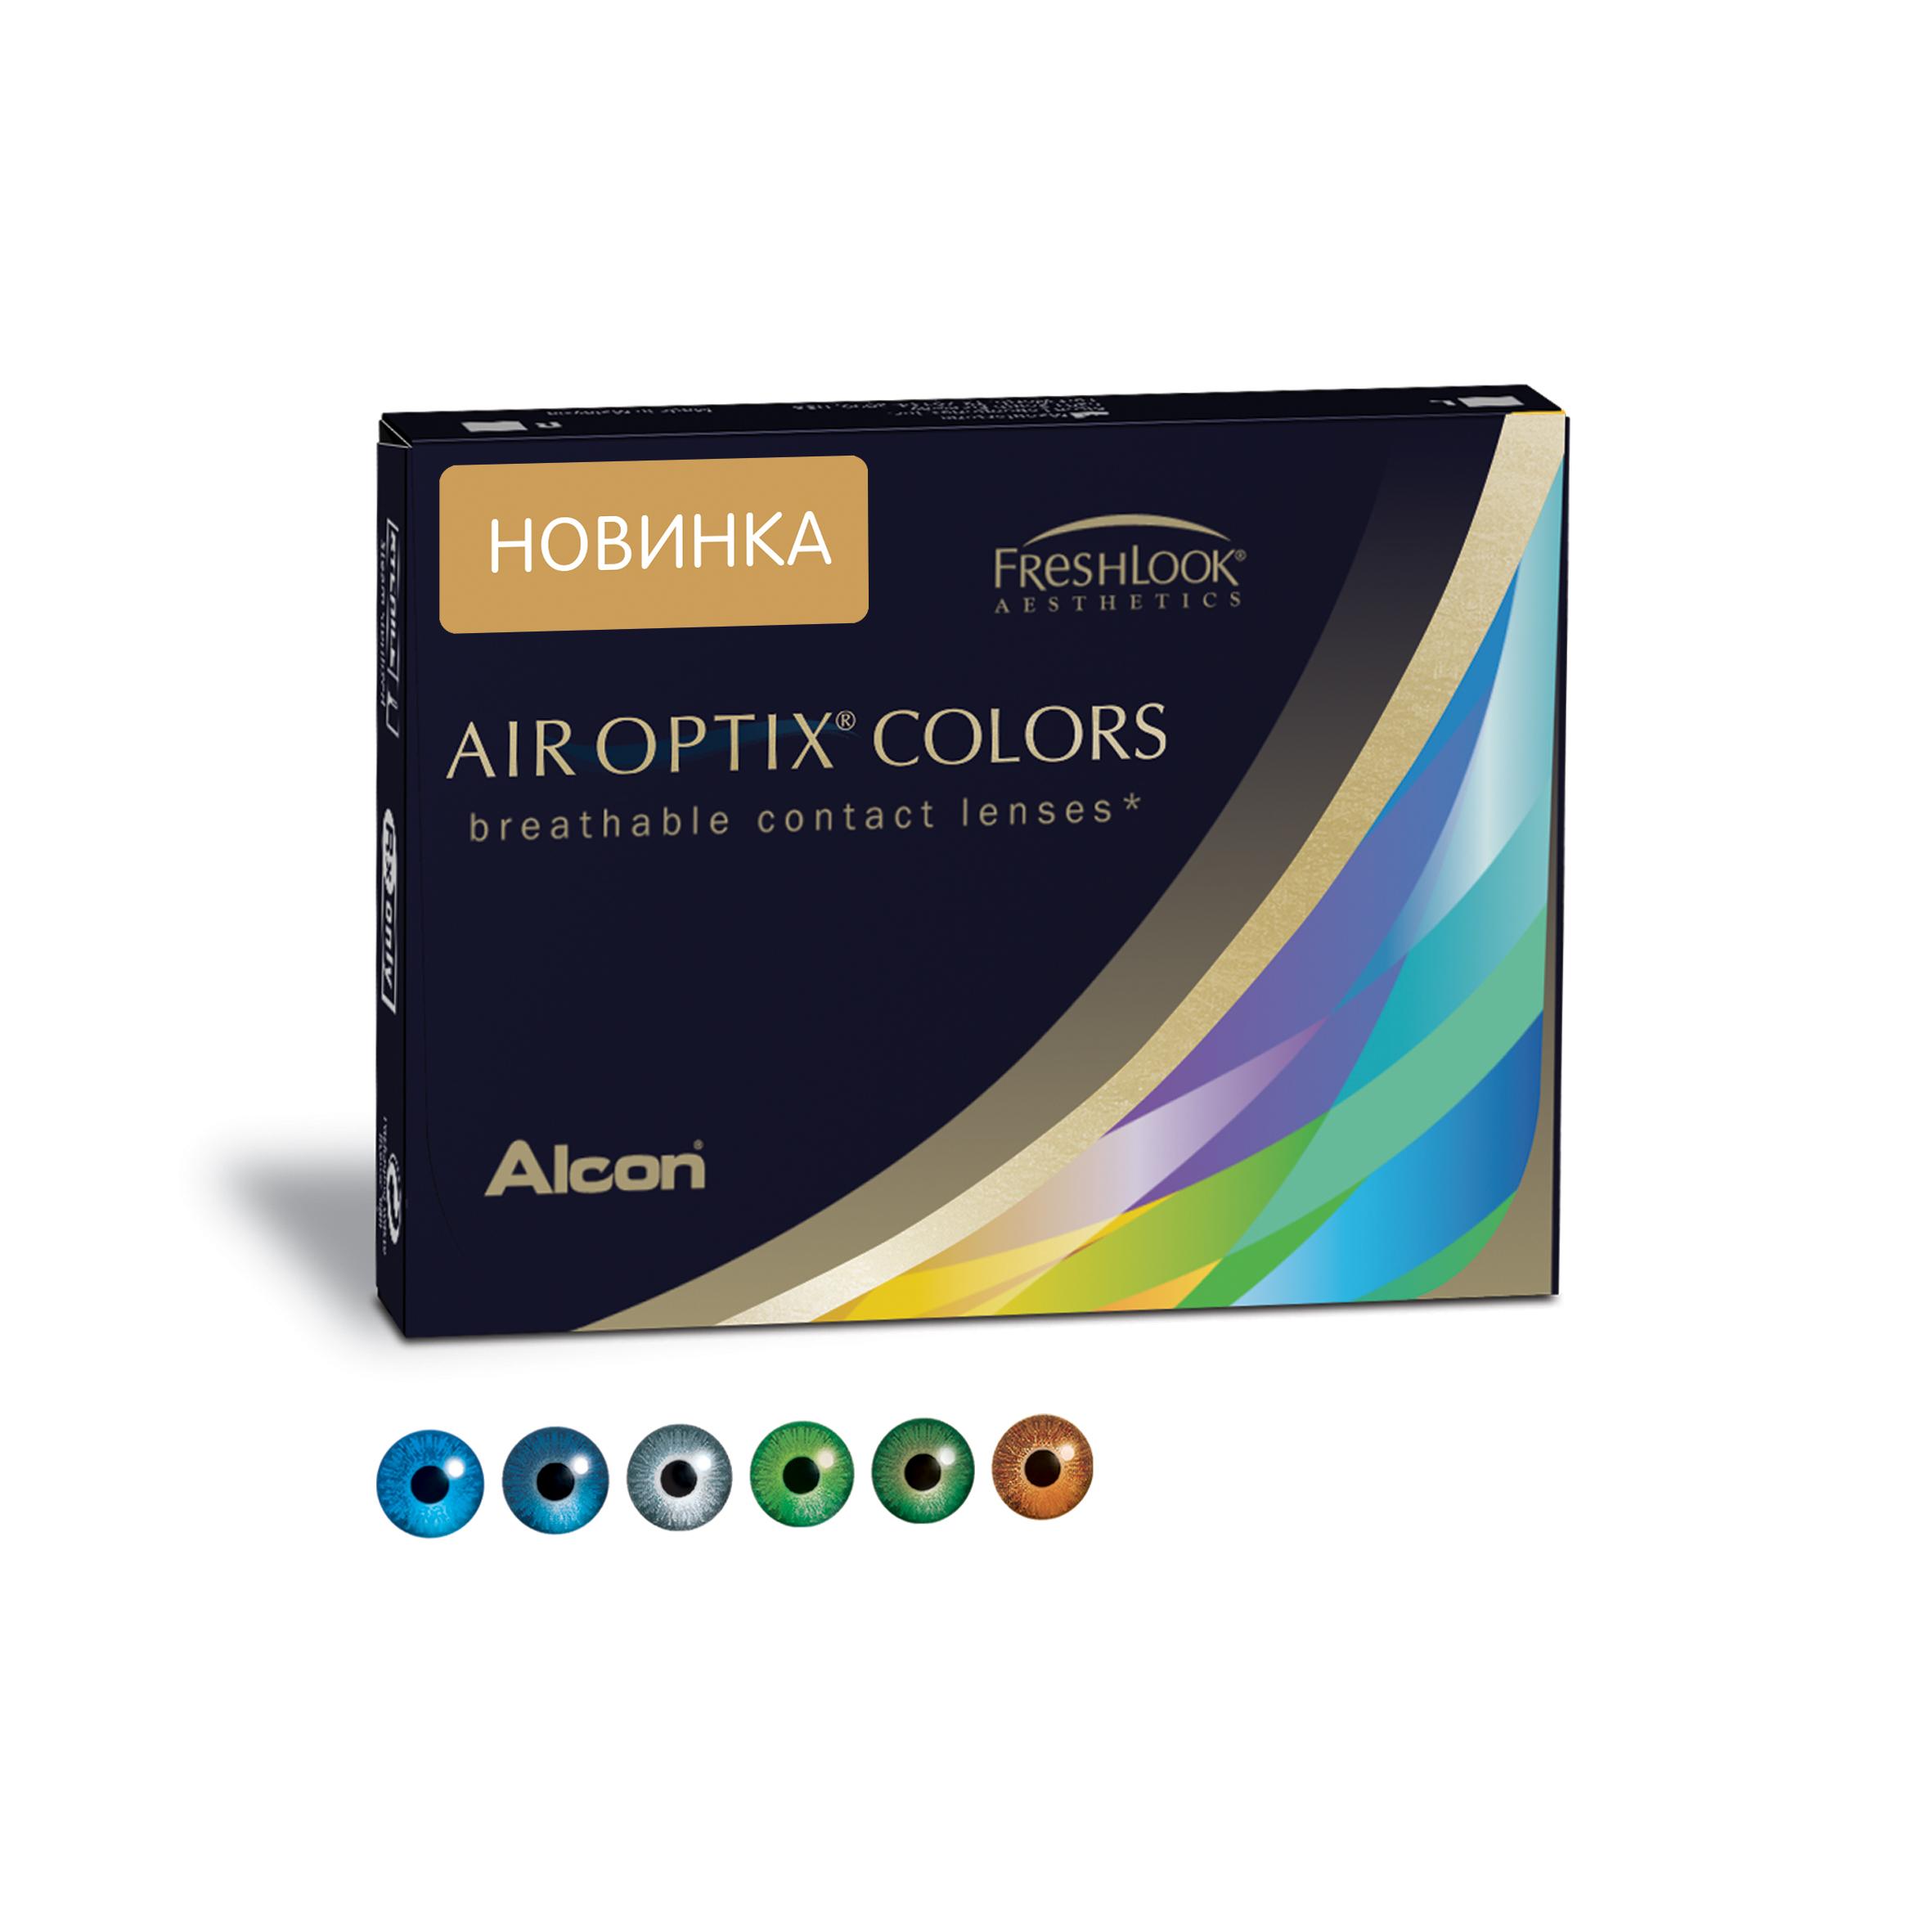 Аlcon контактные линзы Air Optix Colors 2 шт -0.50 Gemstone Green